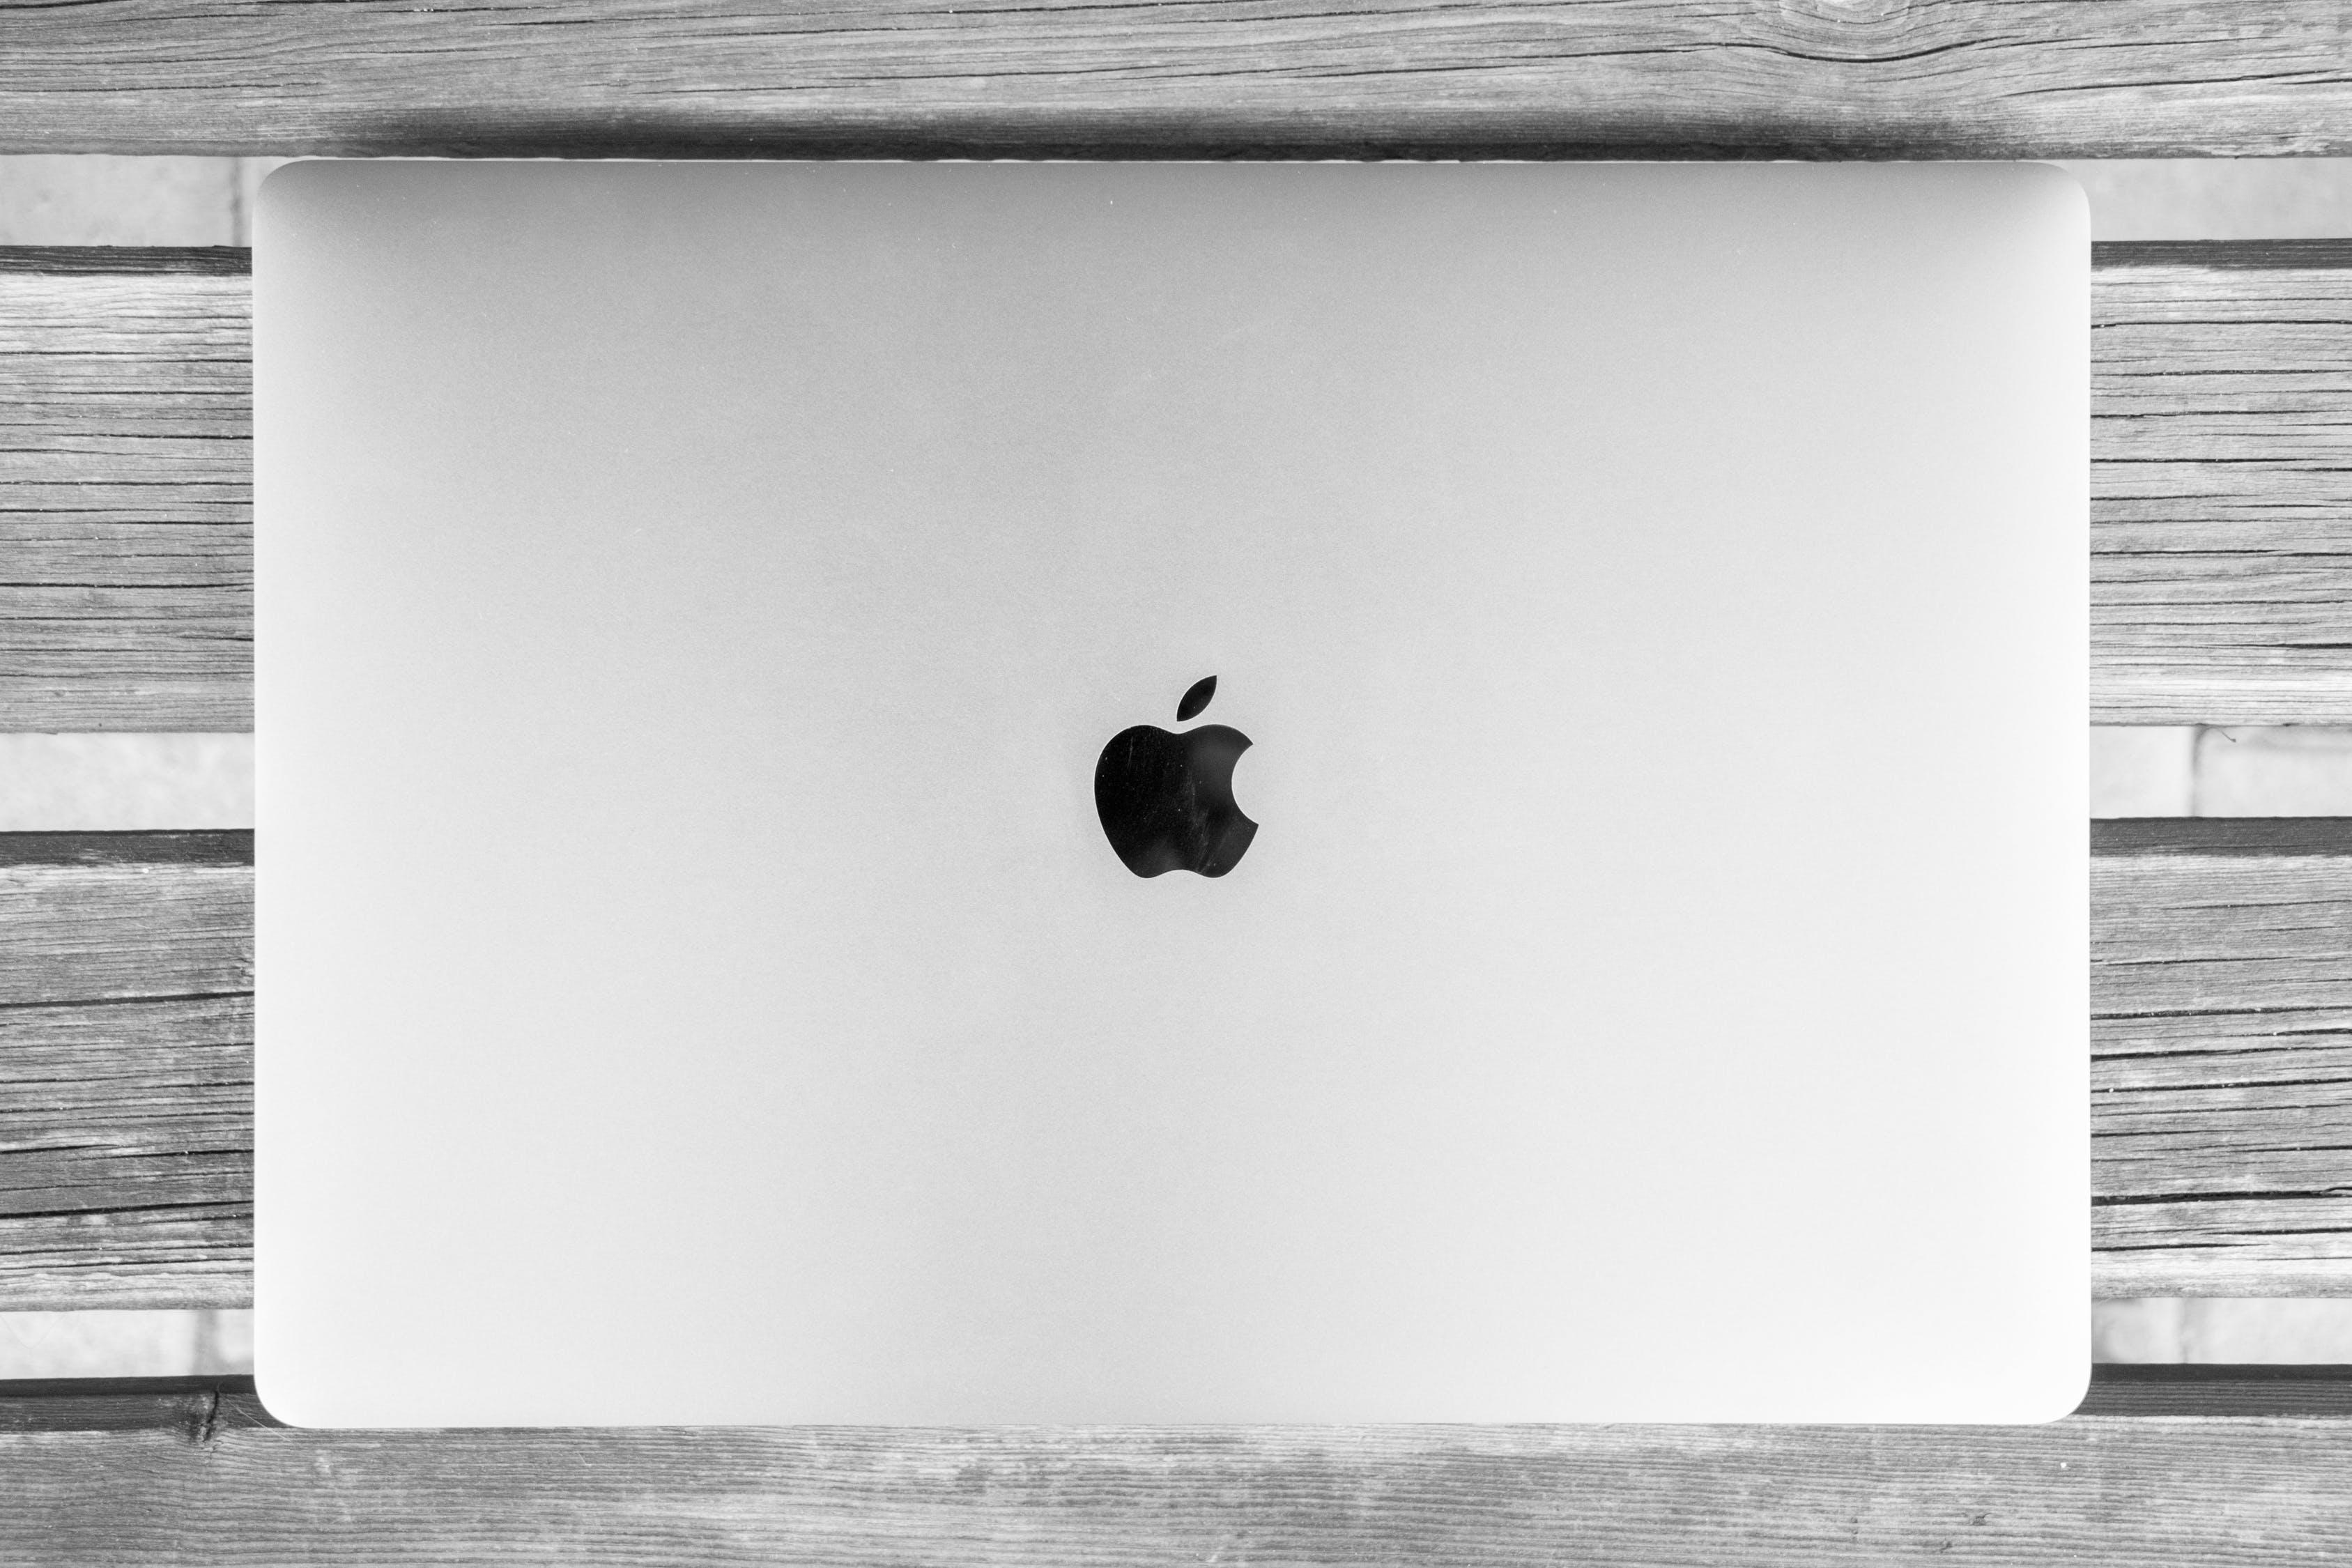 Apple's distinctive logo is black